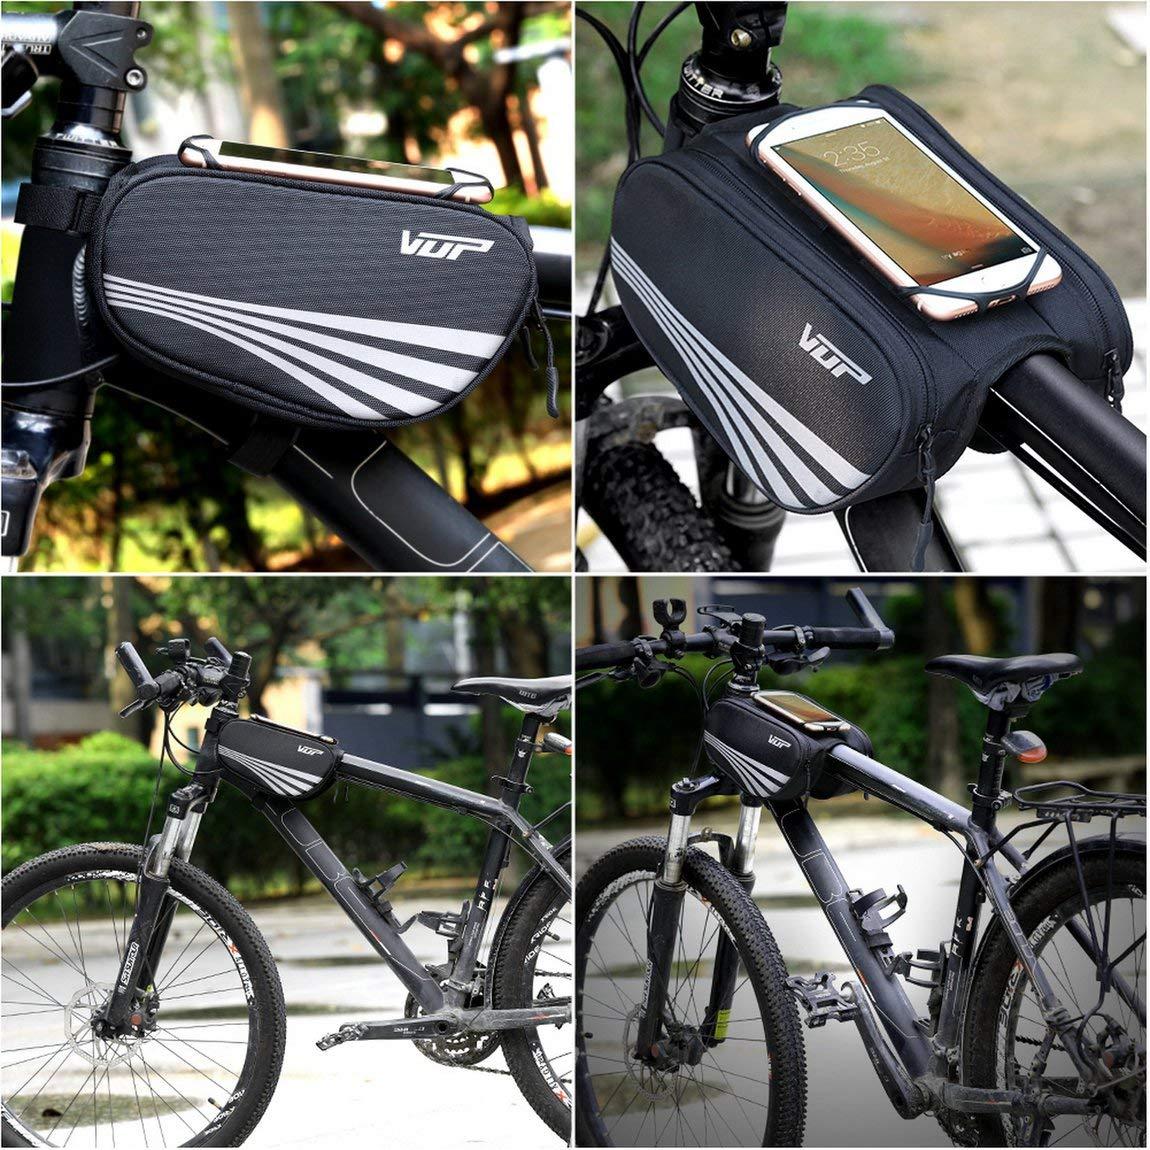 Color: Negro 73JohnPol Impermeable VB-016 Ciclismo Bicicleta Tubo Delantero Bastidor del Bolso Mountain MTB Bike Pouch Holder Saddle Bag Phone Pouch Bag